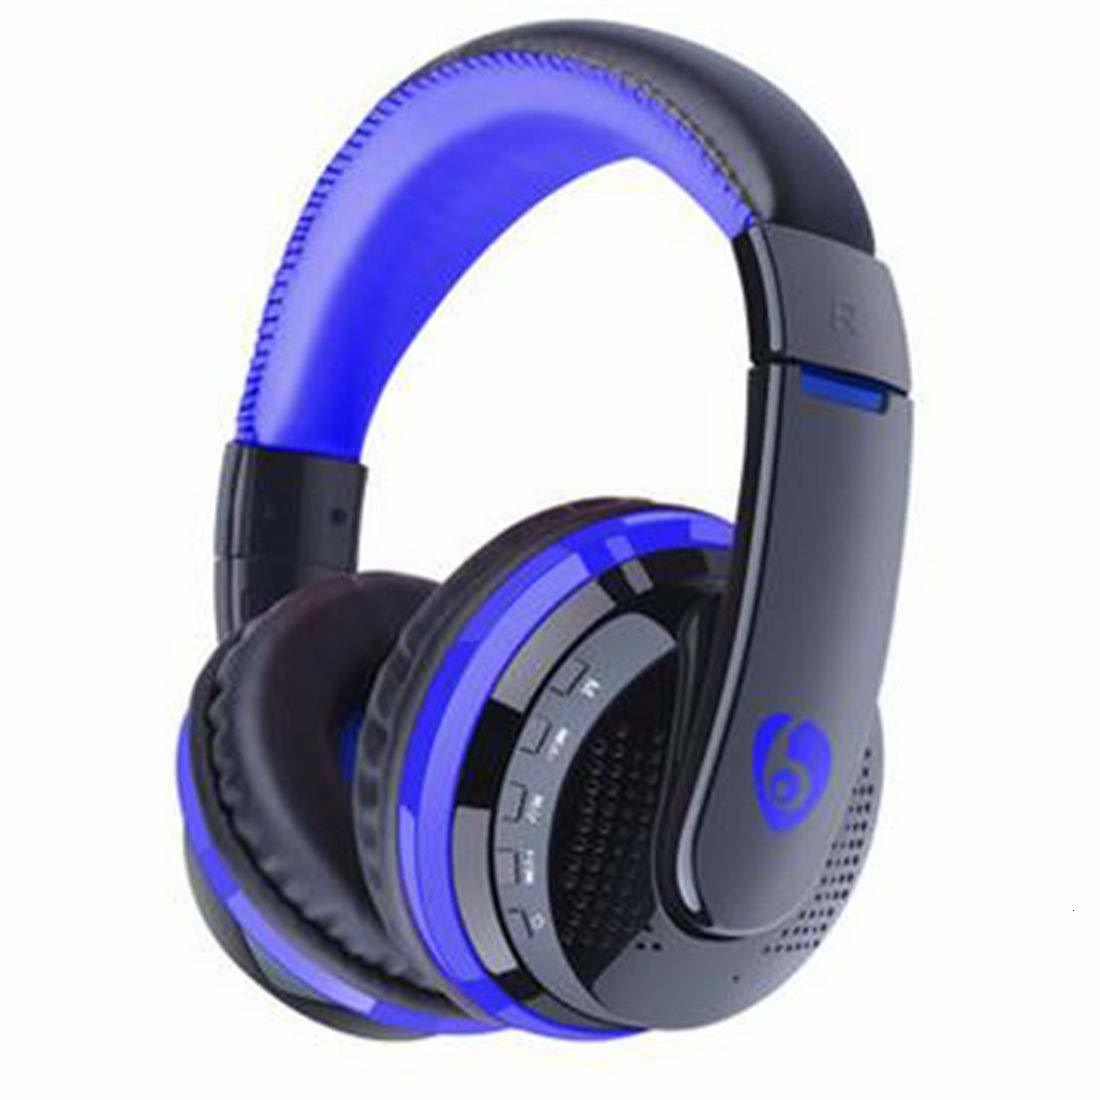 Mx666 Wireless Headphones Bluetooth Headset Foldable Headphone Adjustable Earphones With Microphone For Pc Laptop Phone Bluetooth Earphones Headphones Aliexpress